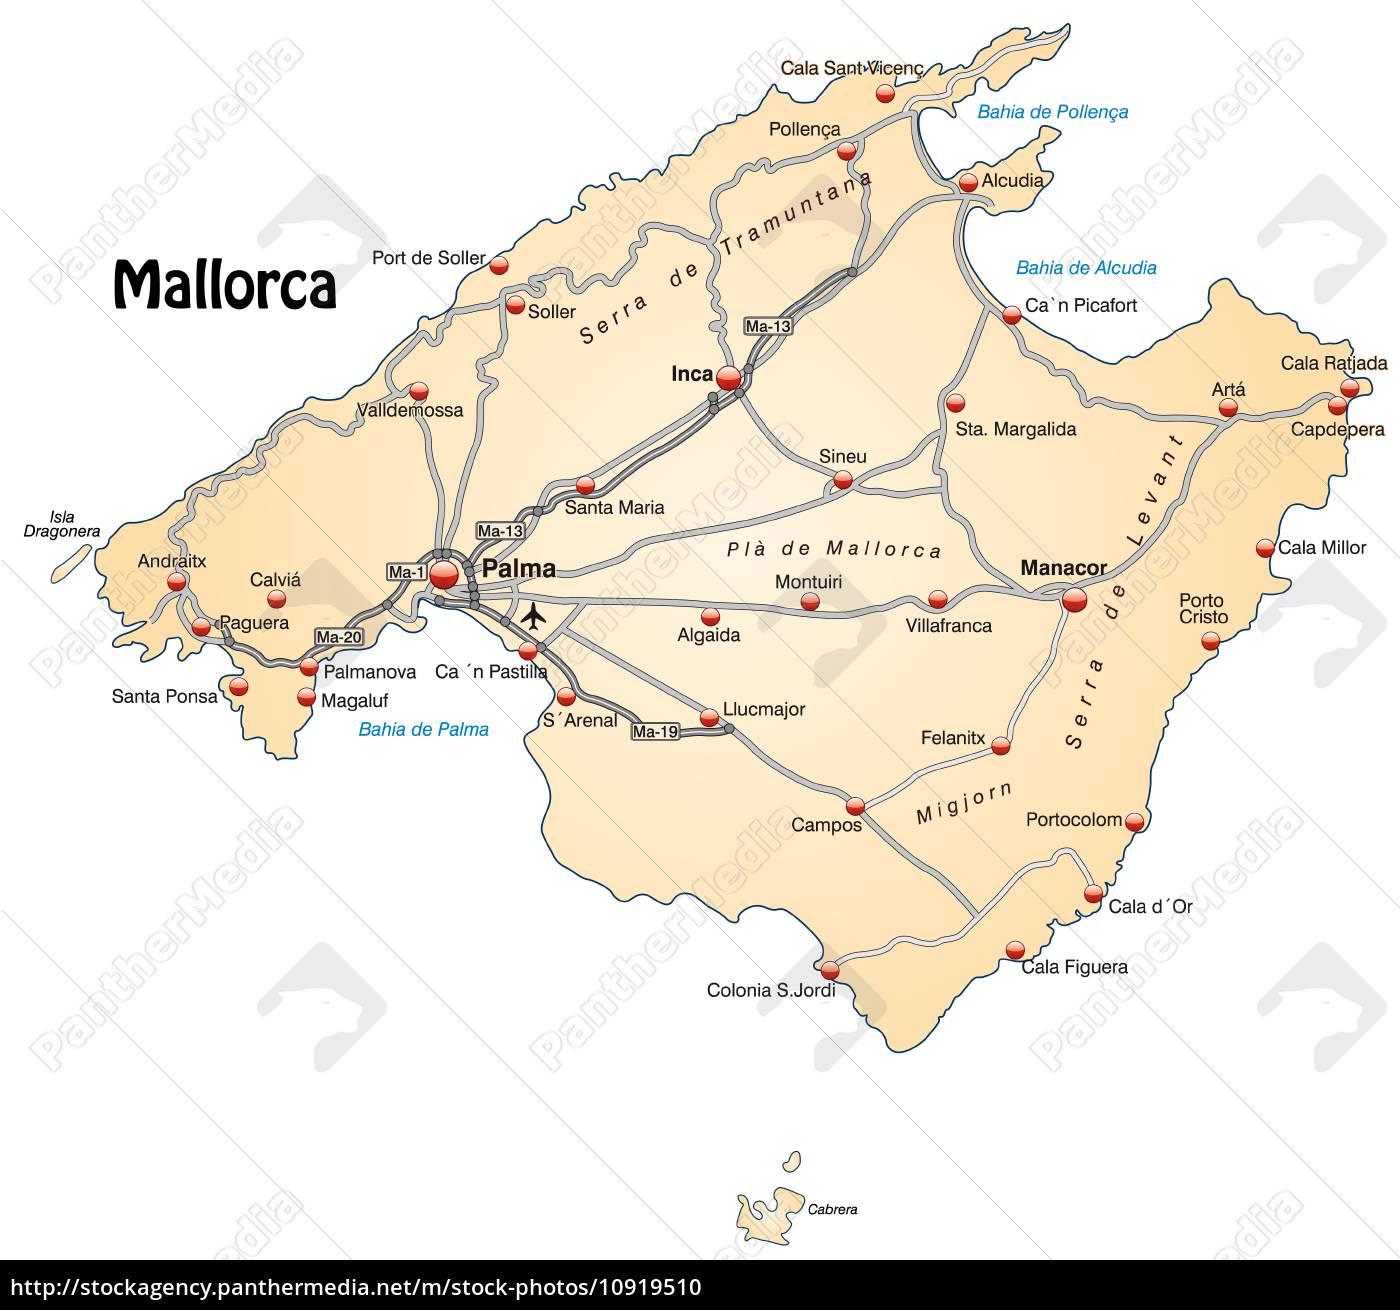 Mallorca Karte Alcudia.Stock Photo 10919510 Karte Von Mallorca Mit Verkehrsnetz In Pastellorange